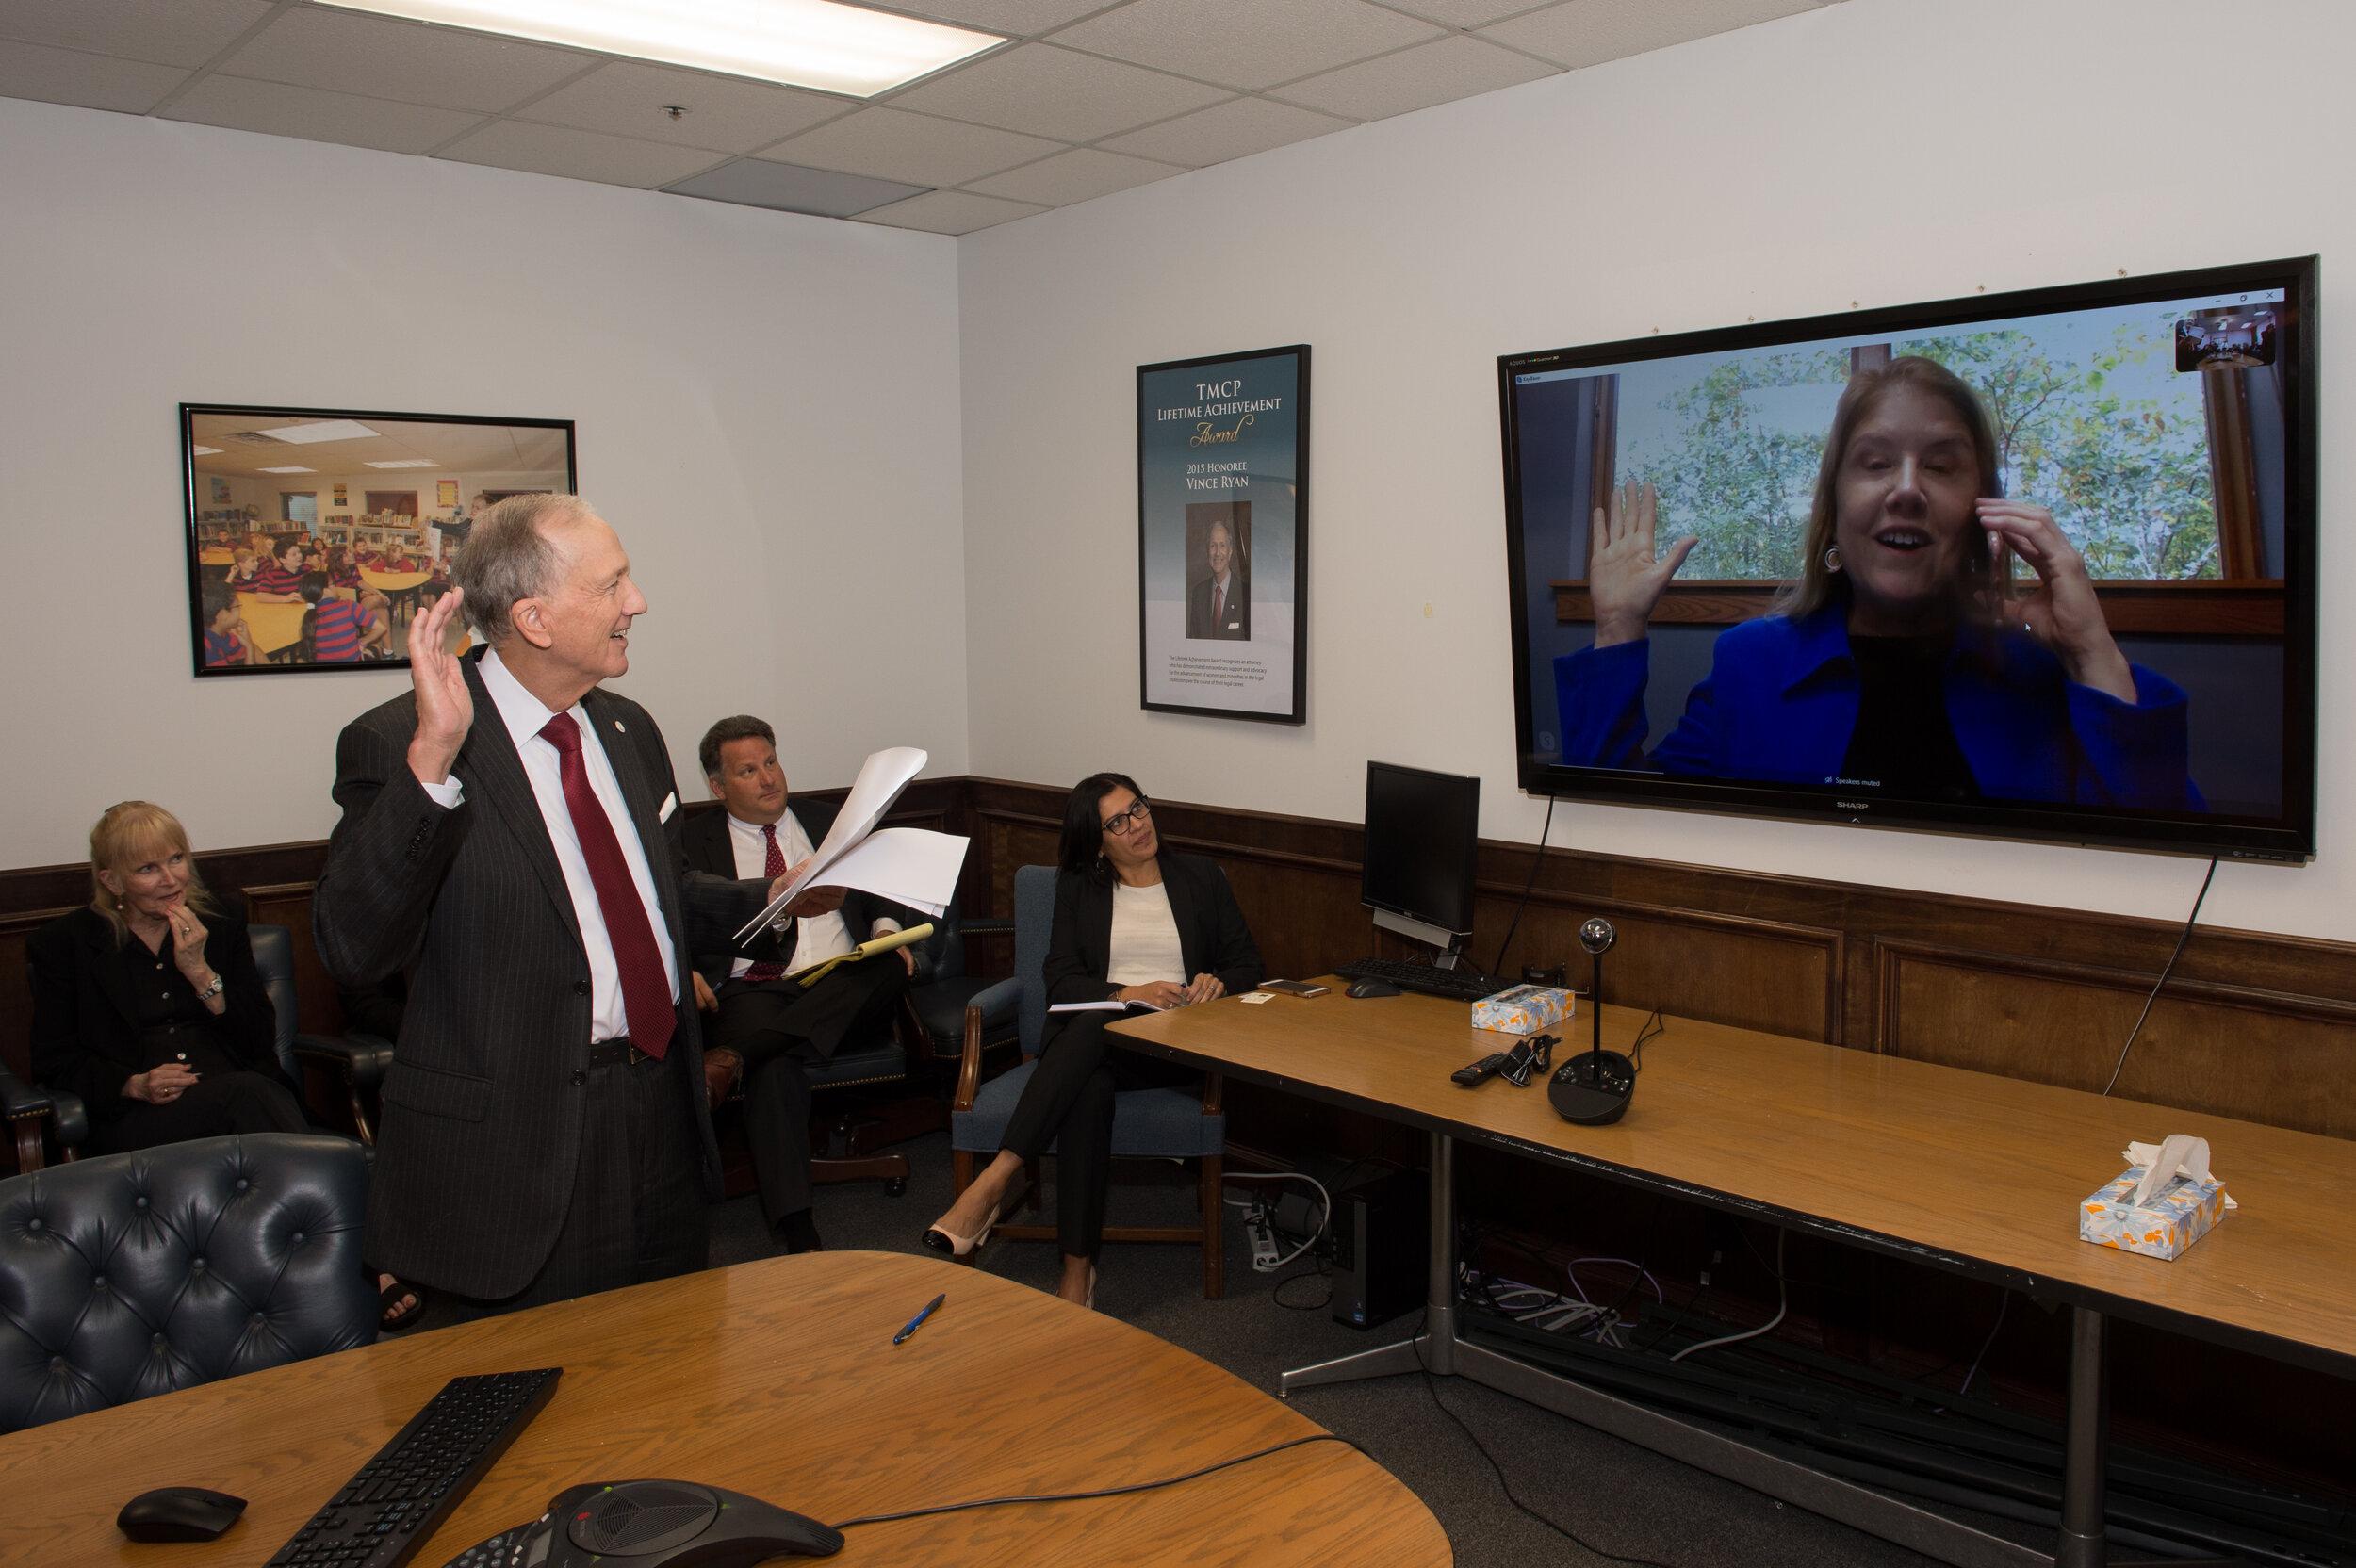 County Attorney Vince Ryan swears in Clarissa Bauer via Skype.